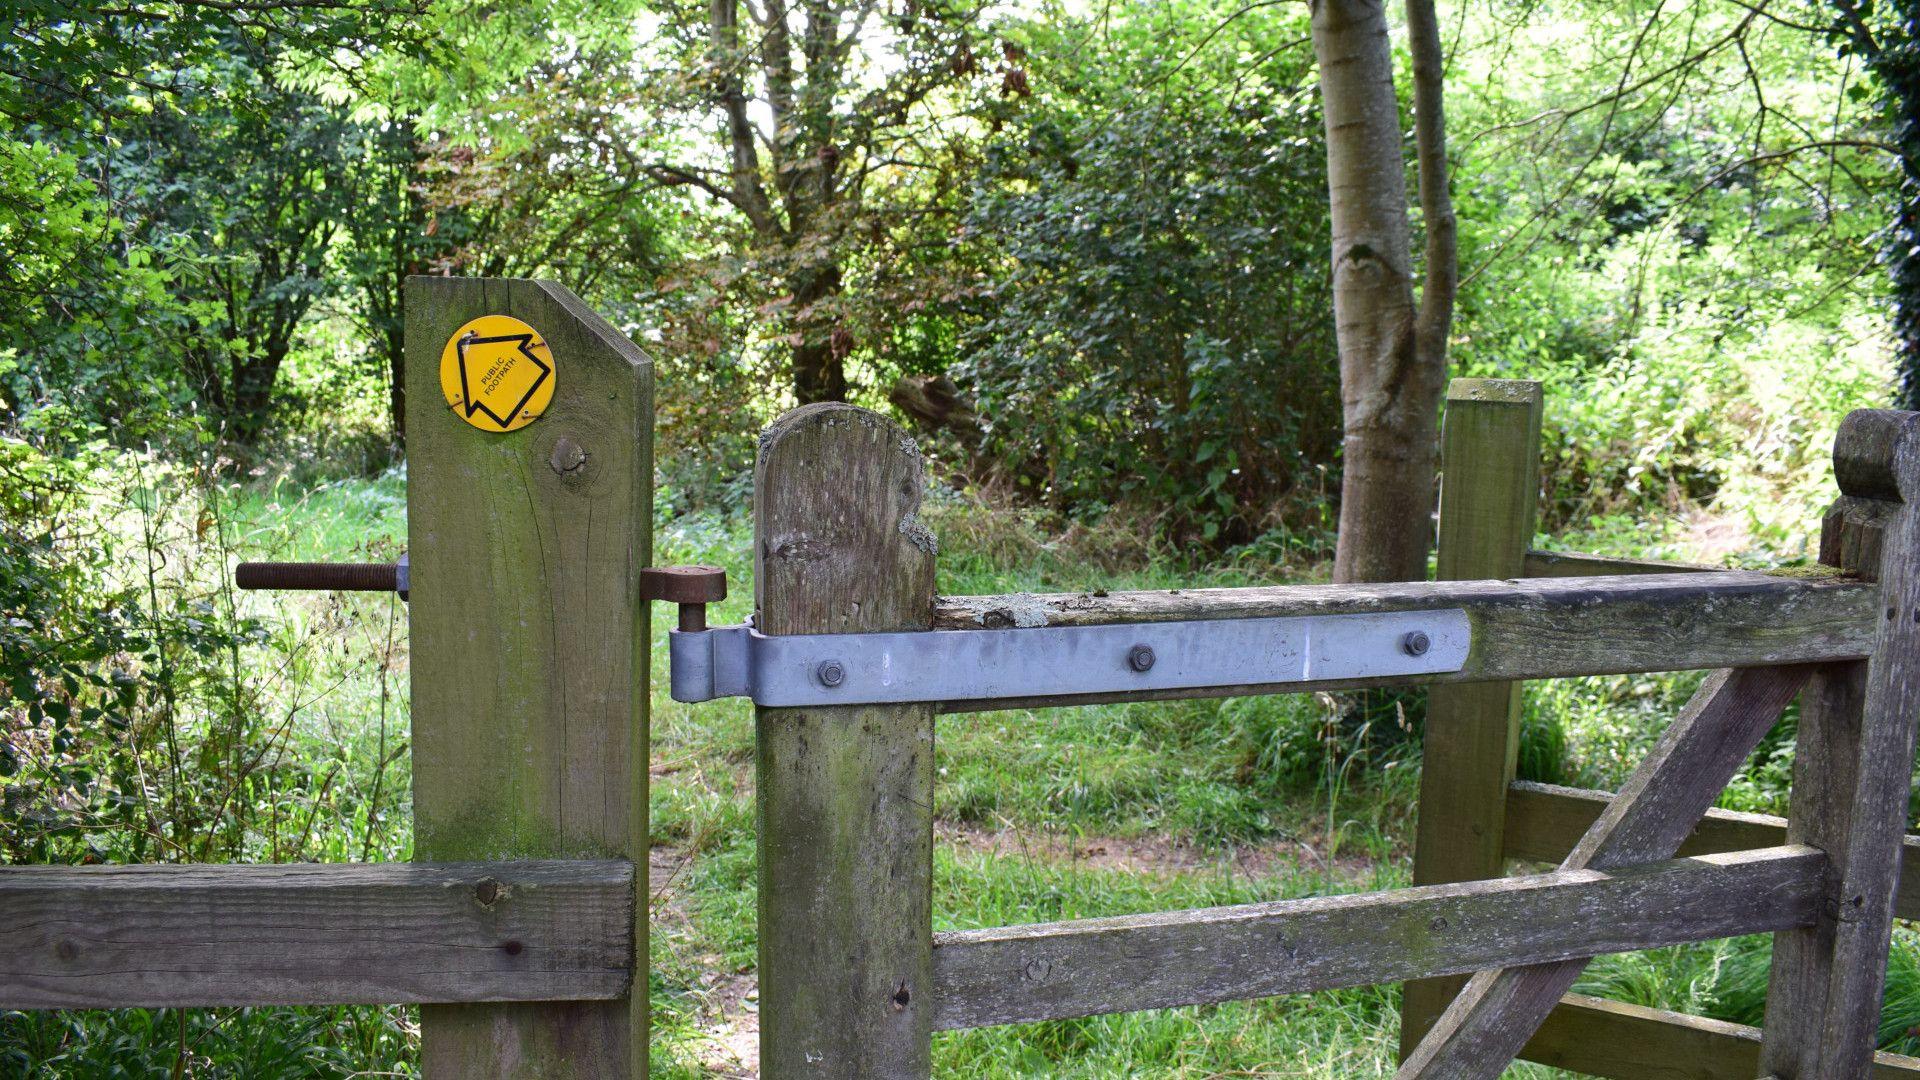 Local footpaths, Shepherds Hut at Avon Farm, Bolthole Retreats